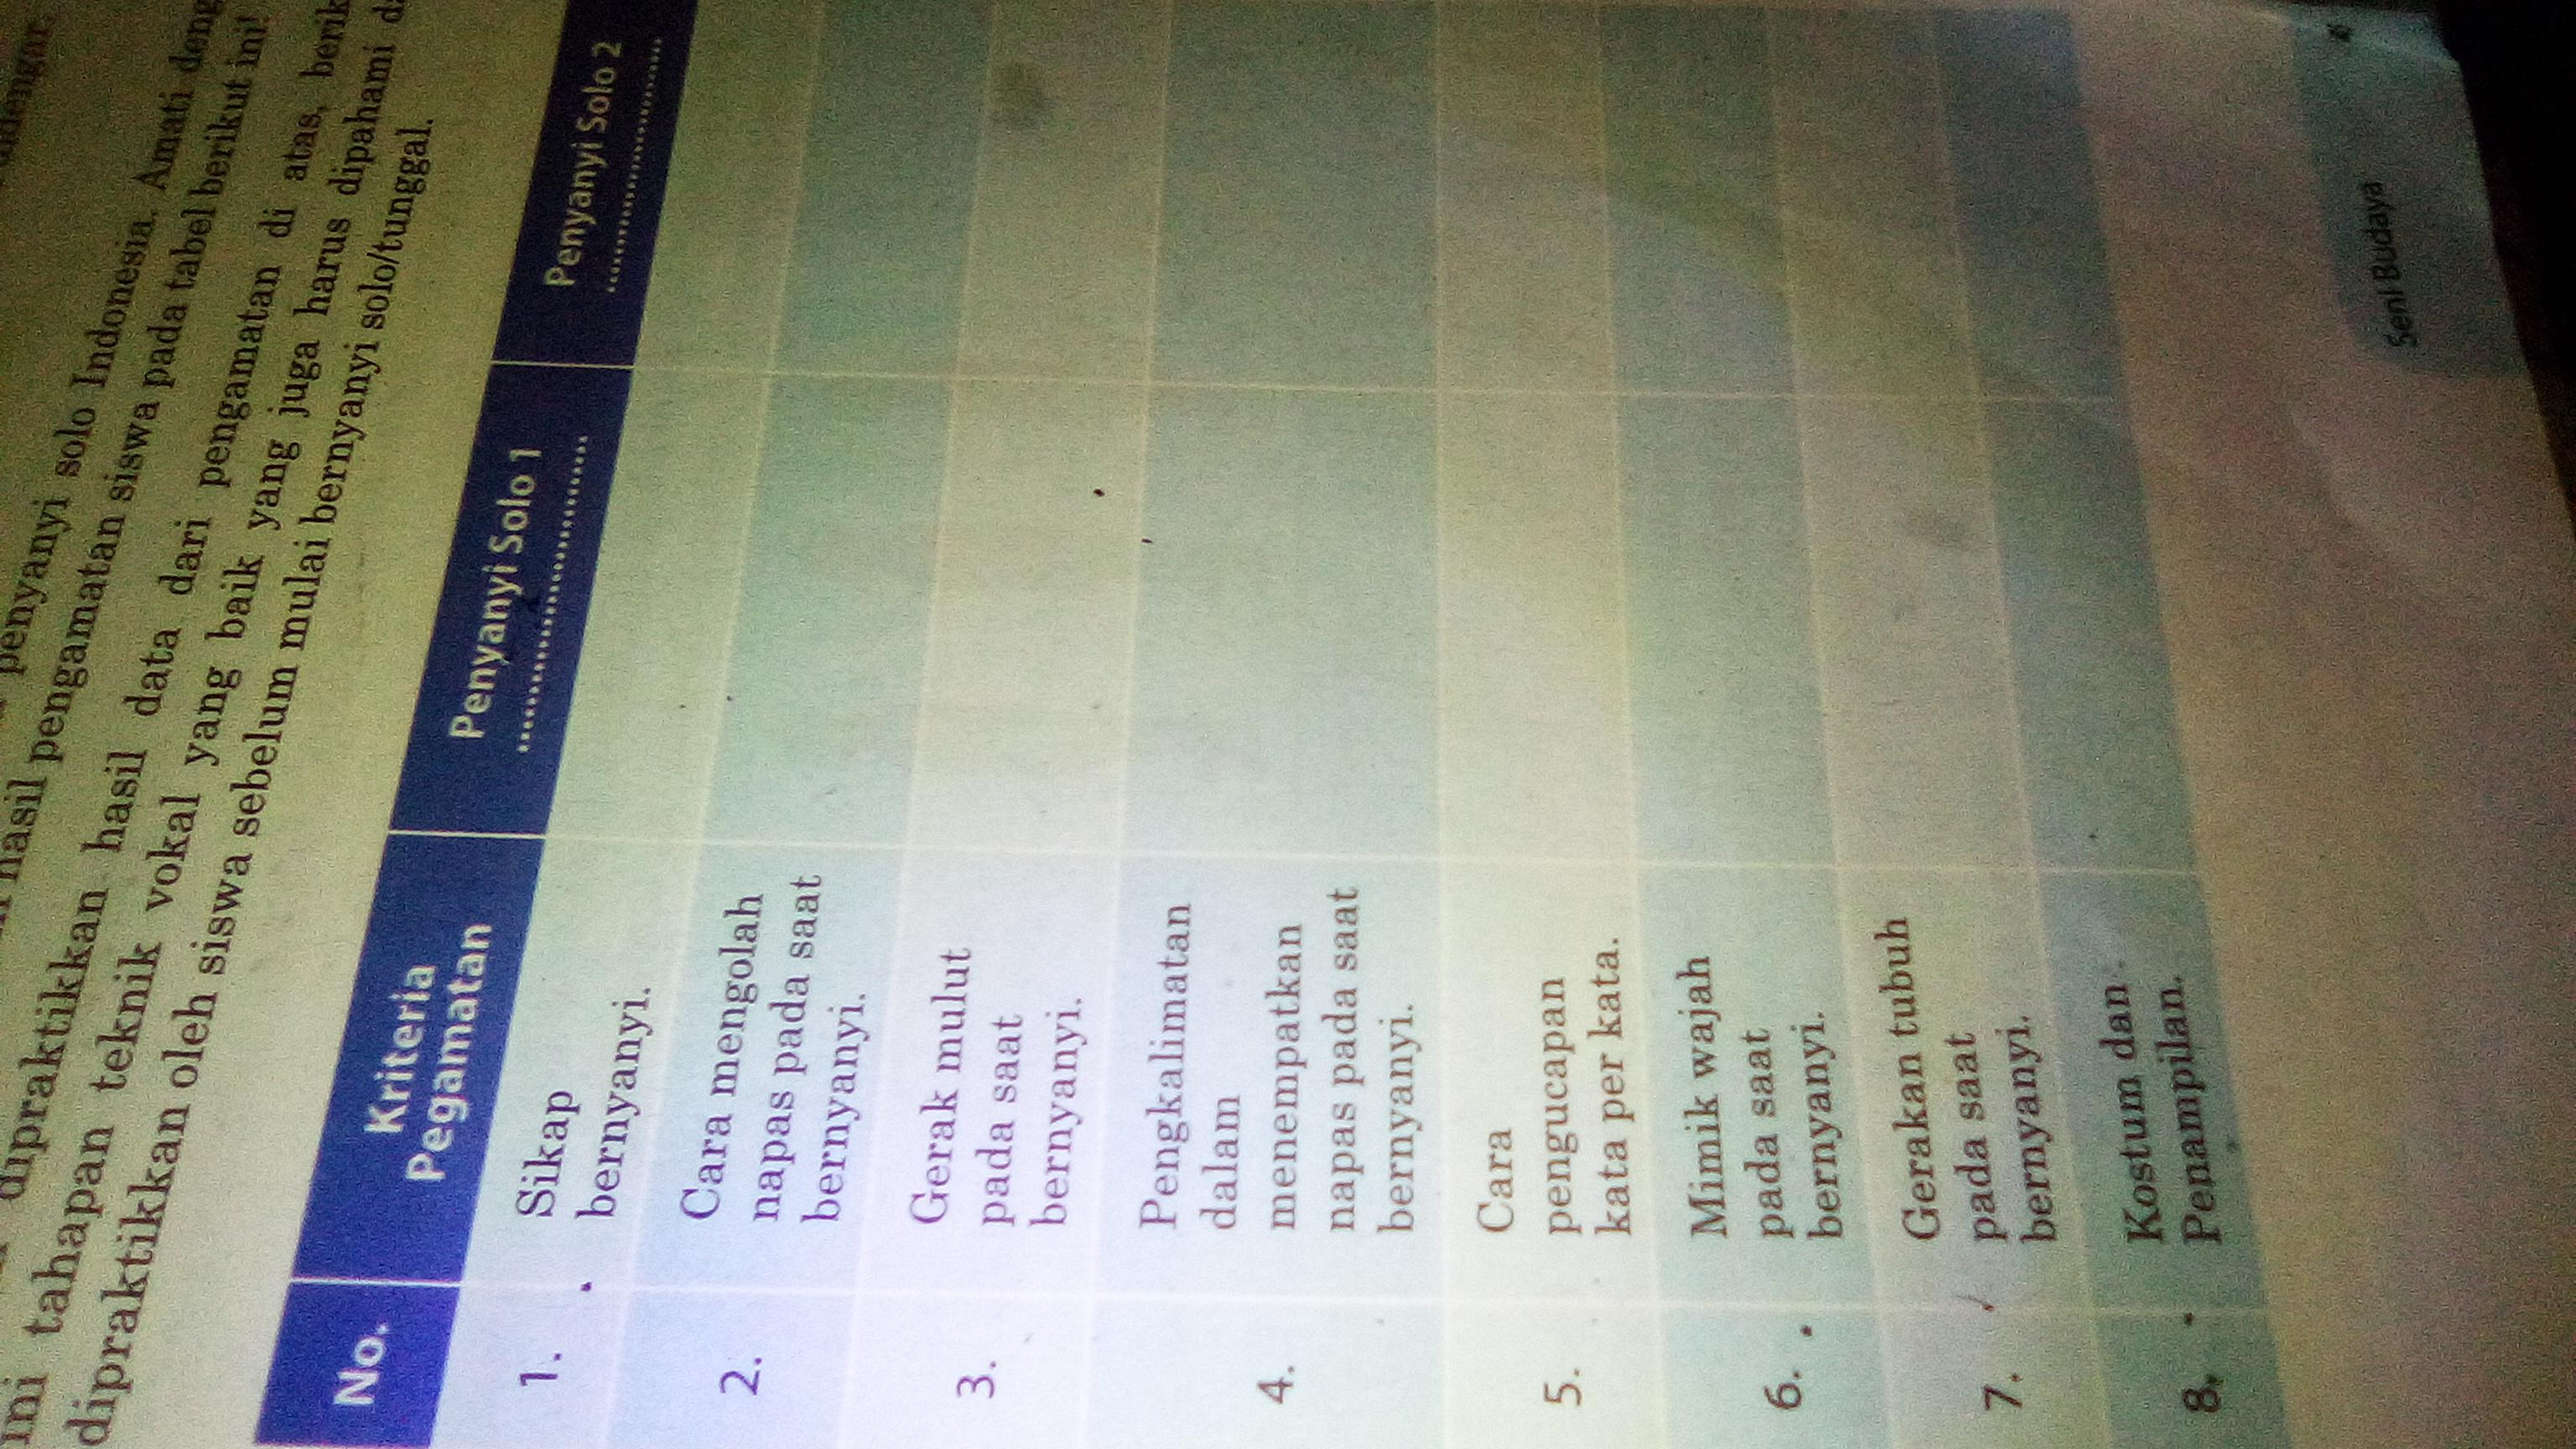 Tuliskan Kriteria Pengamatan Dari Penyanyi Solo 1 Dan Penyanyi Solo 2 Indonesia Kriteria Brainly Co Id